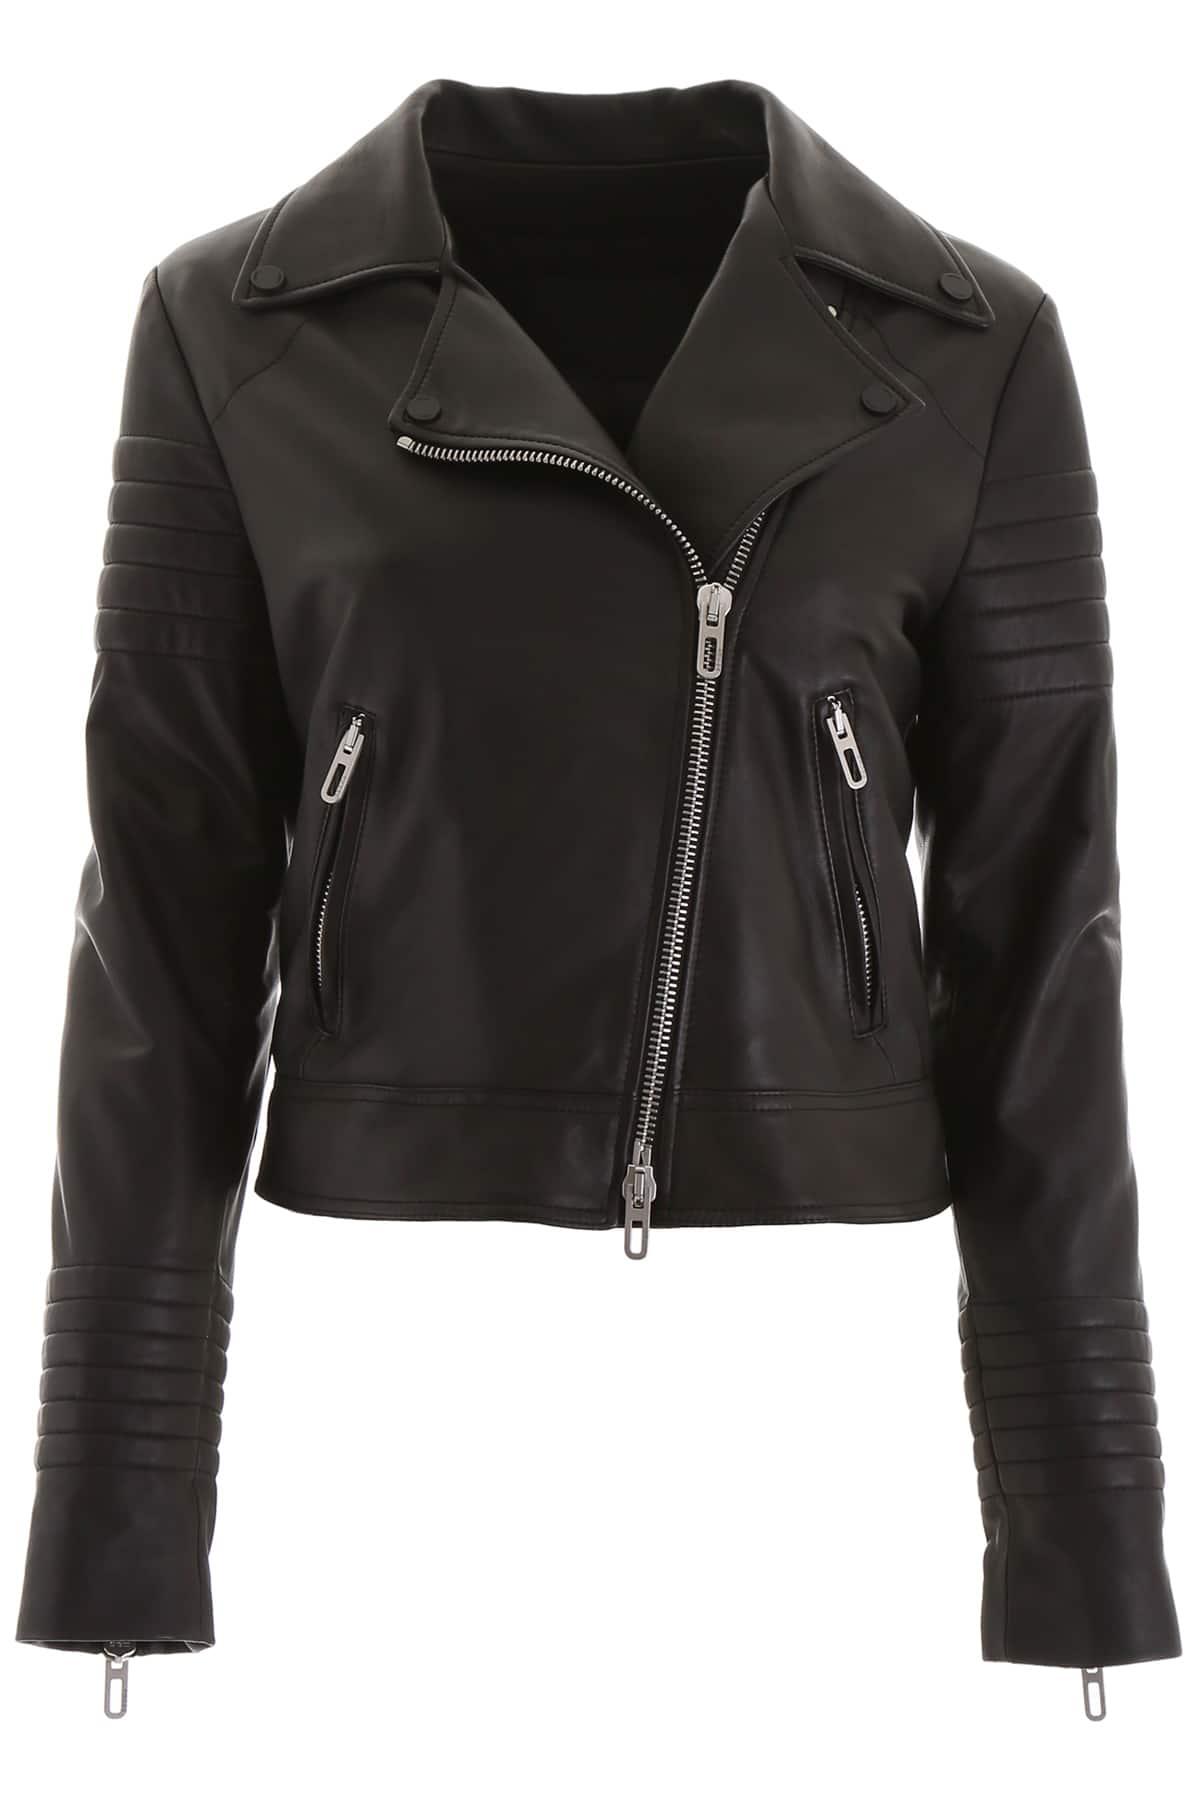 DROME BIKER JACKET M Black Leather